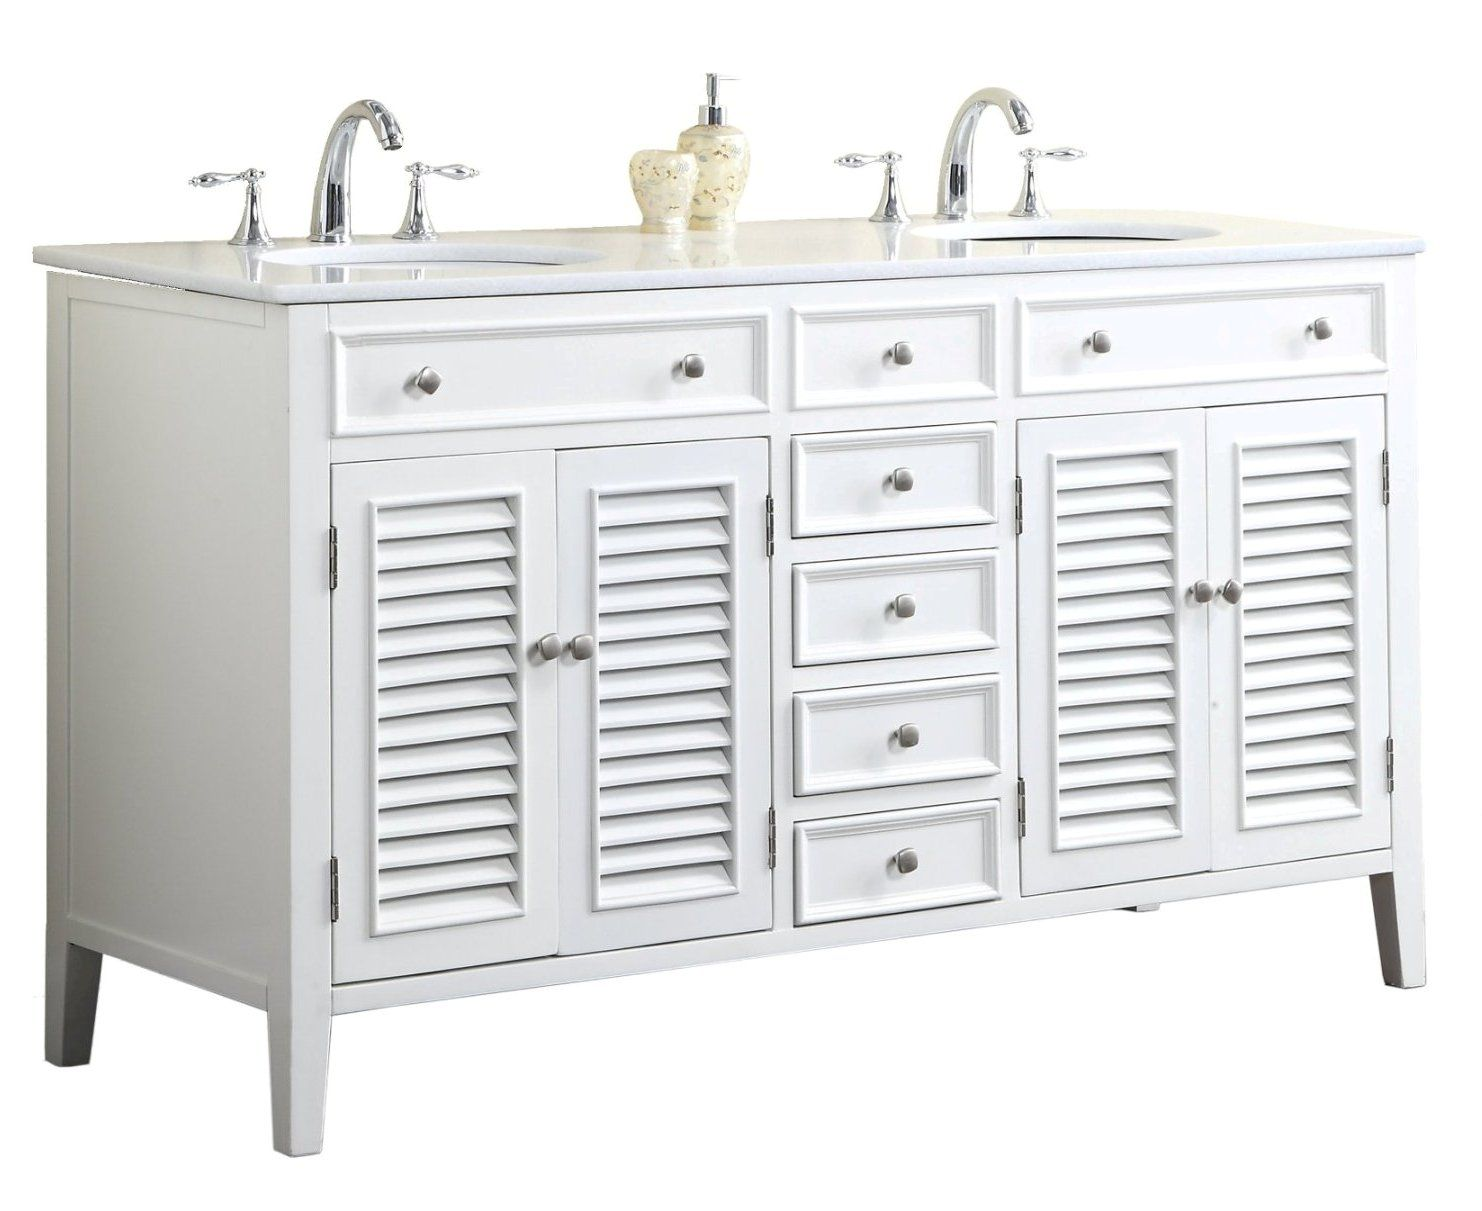 Adelina 60 Inch Antique White Double Sink Bathroom Vanity Marble Top